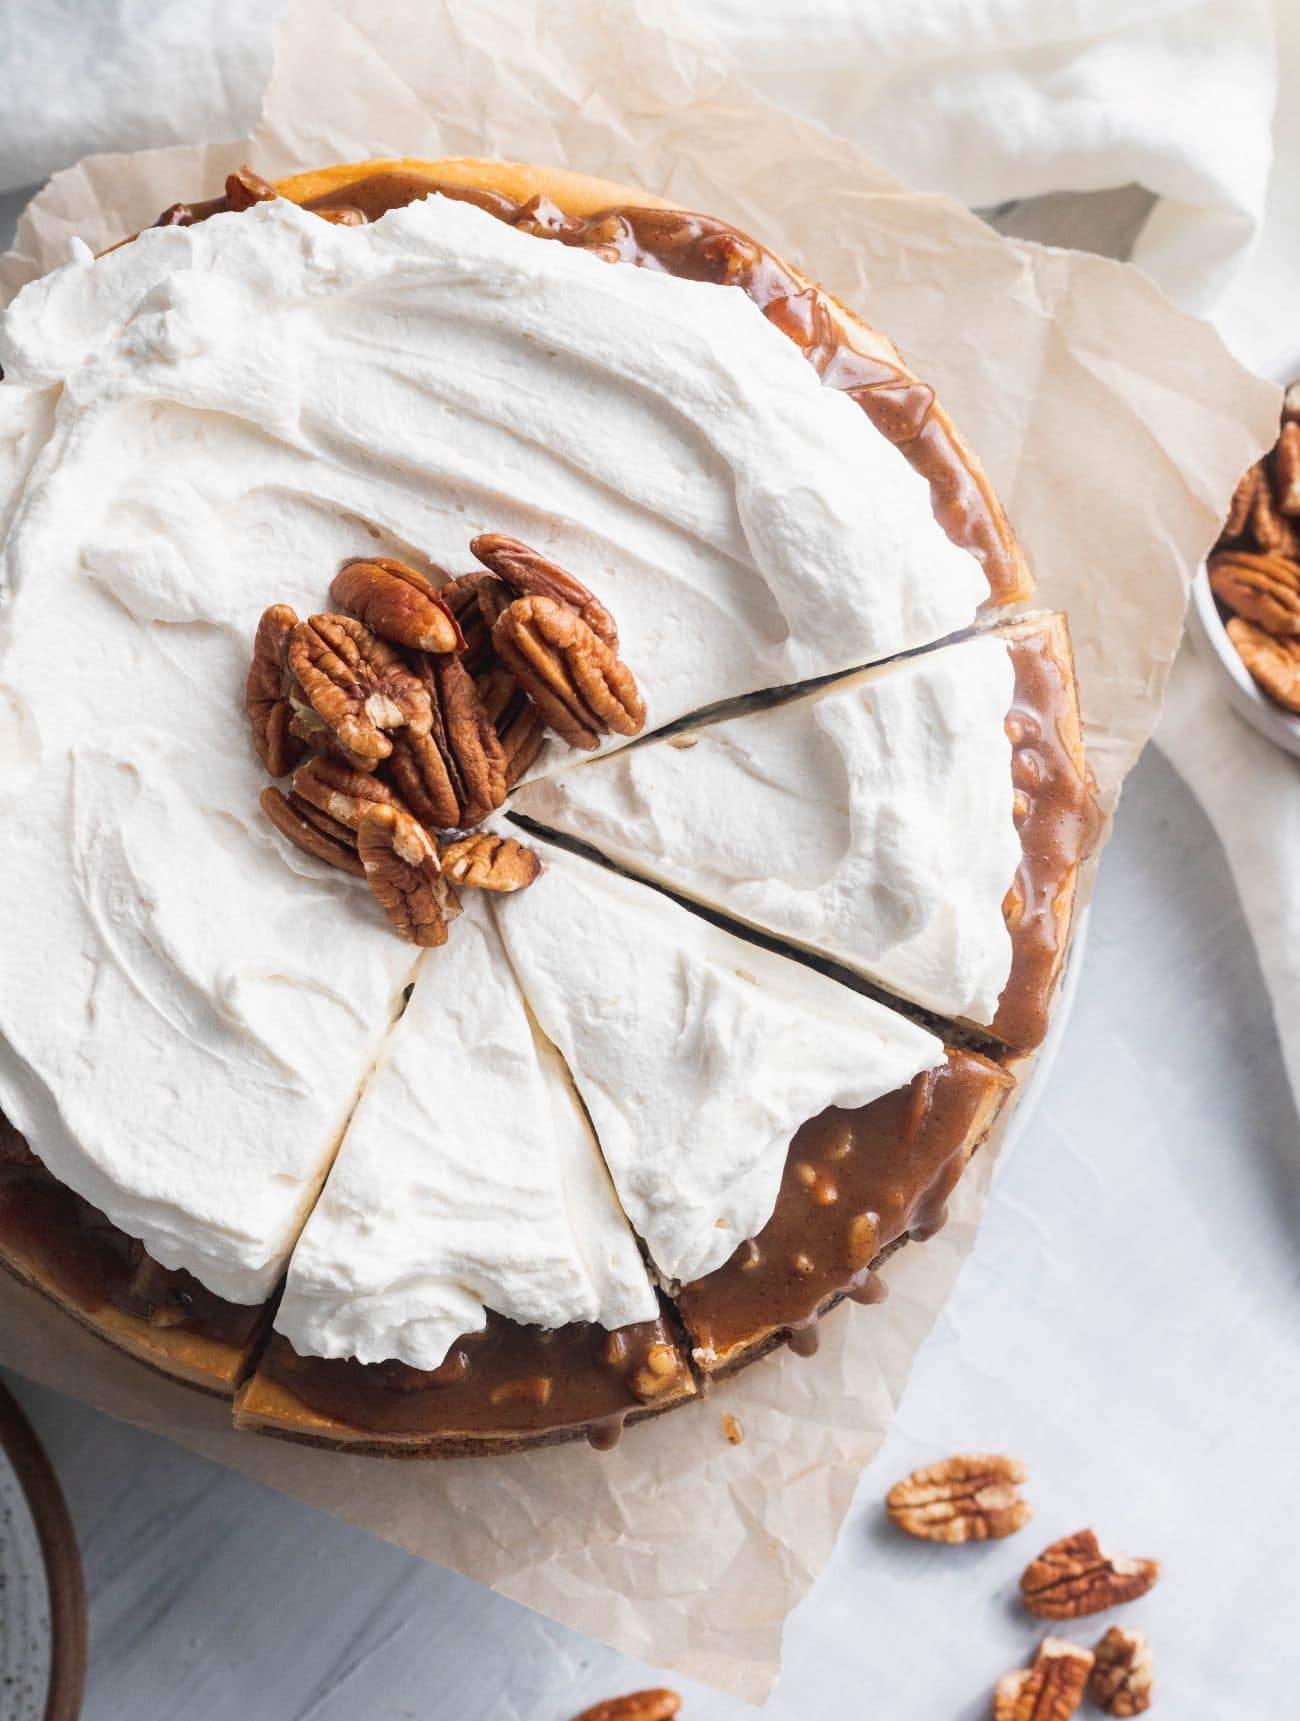 Cinnamon pecan pie cheesecake top view cut into 3 pieces.